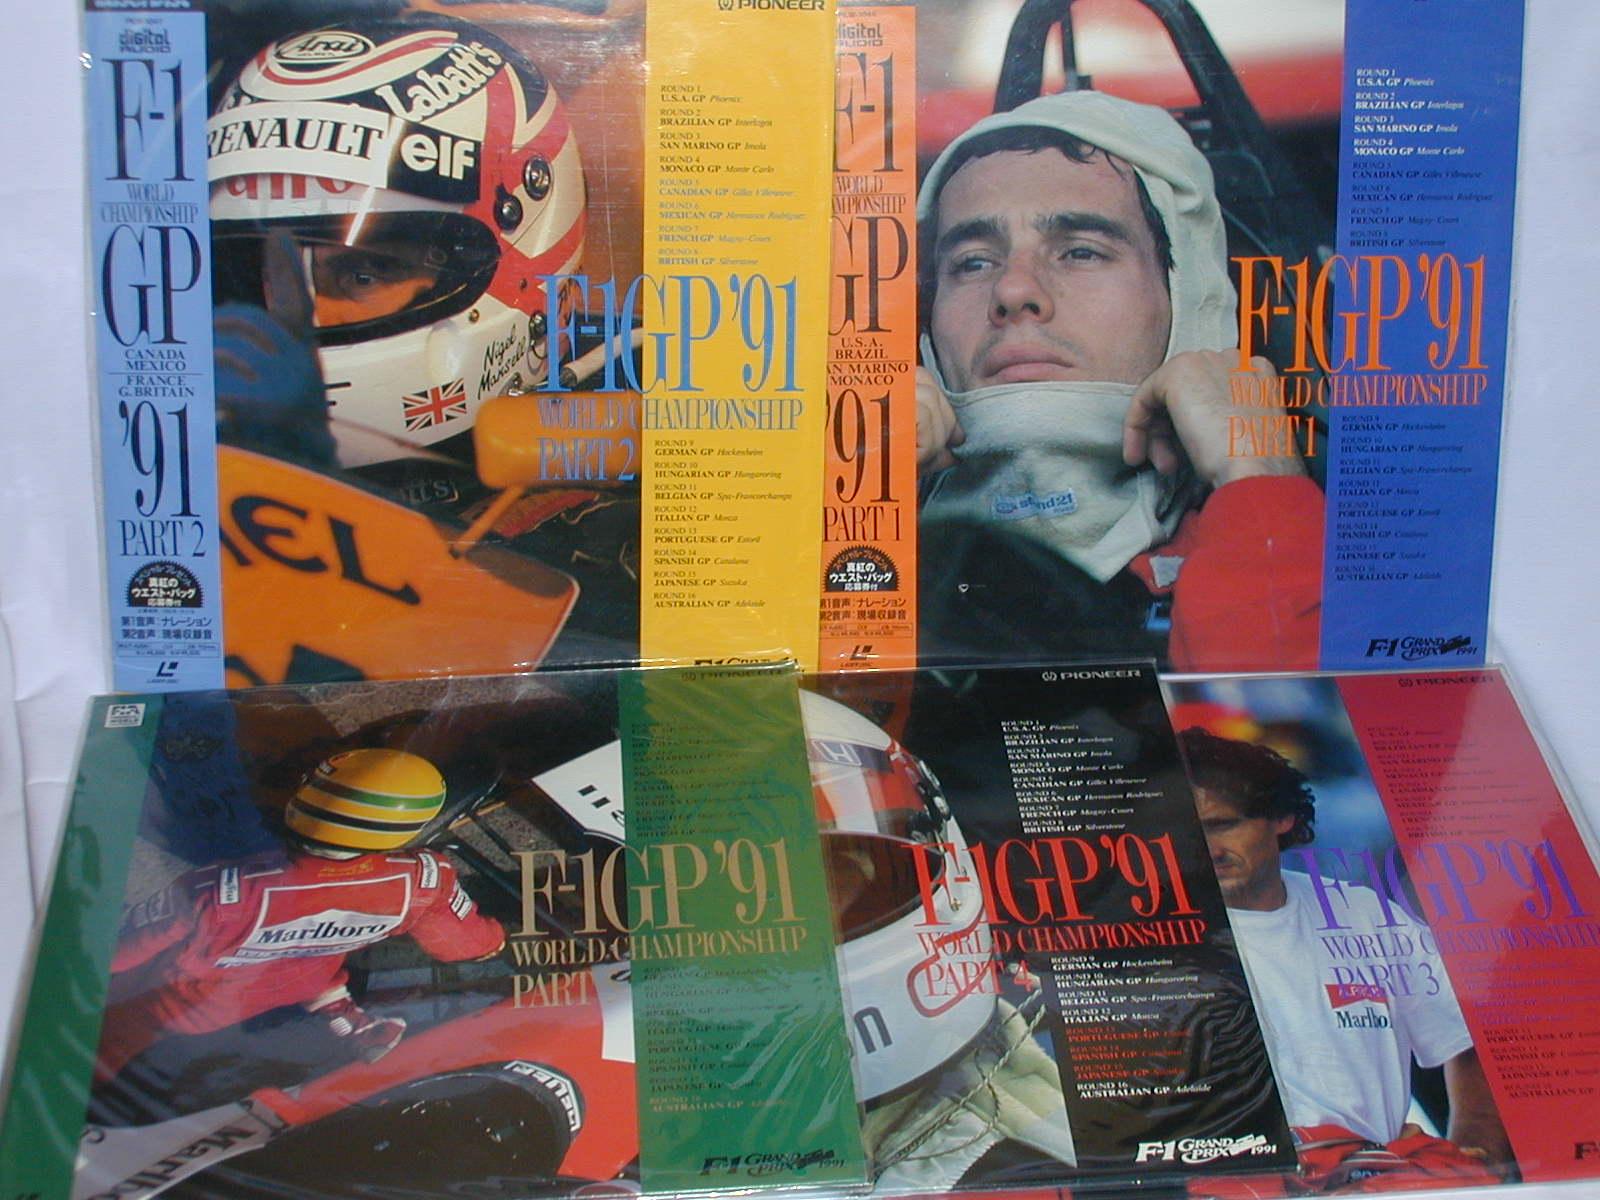 (LD)F-1グランプリ1991 ワールドチャンピオンシップラウンドVOL.1~5 全5巻セット